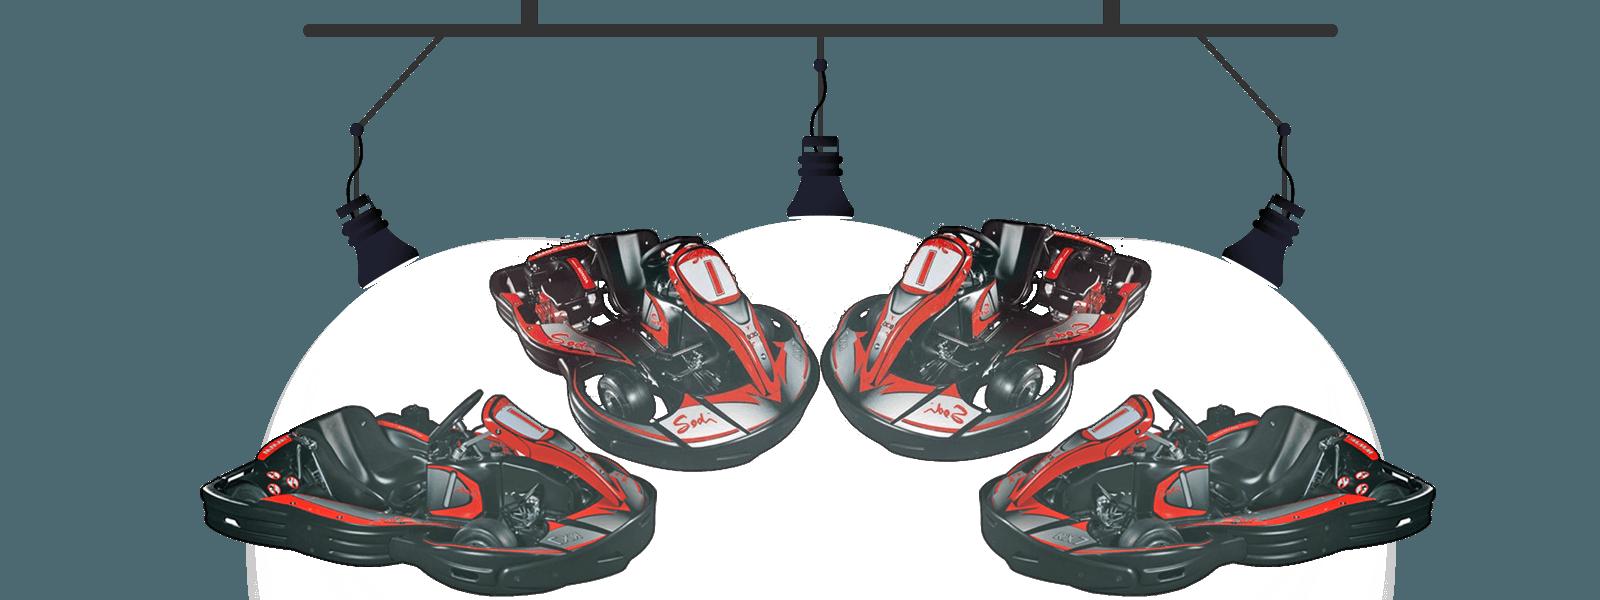 SODI RX7 - Karts - Karting - Indoor - Wakefield